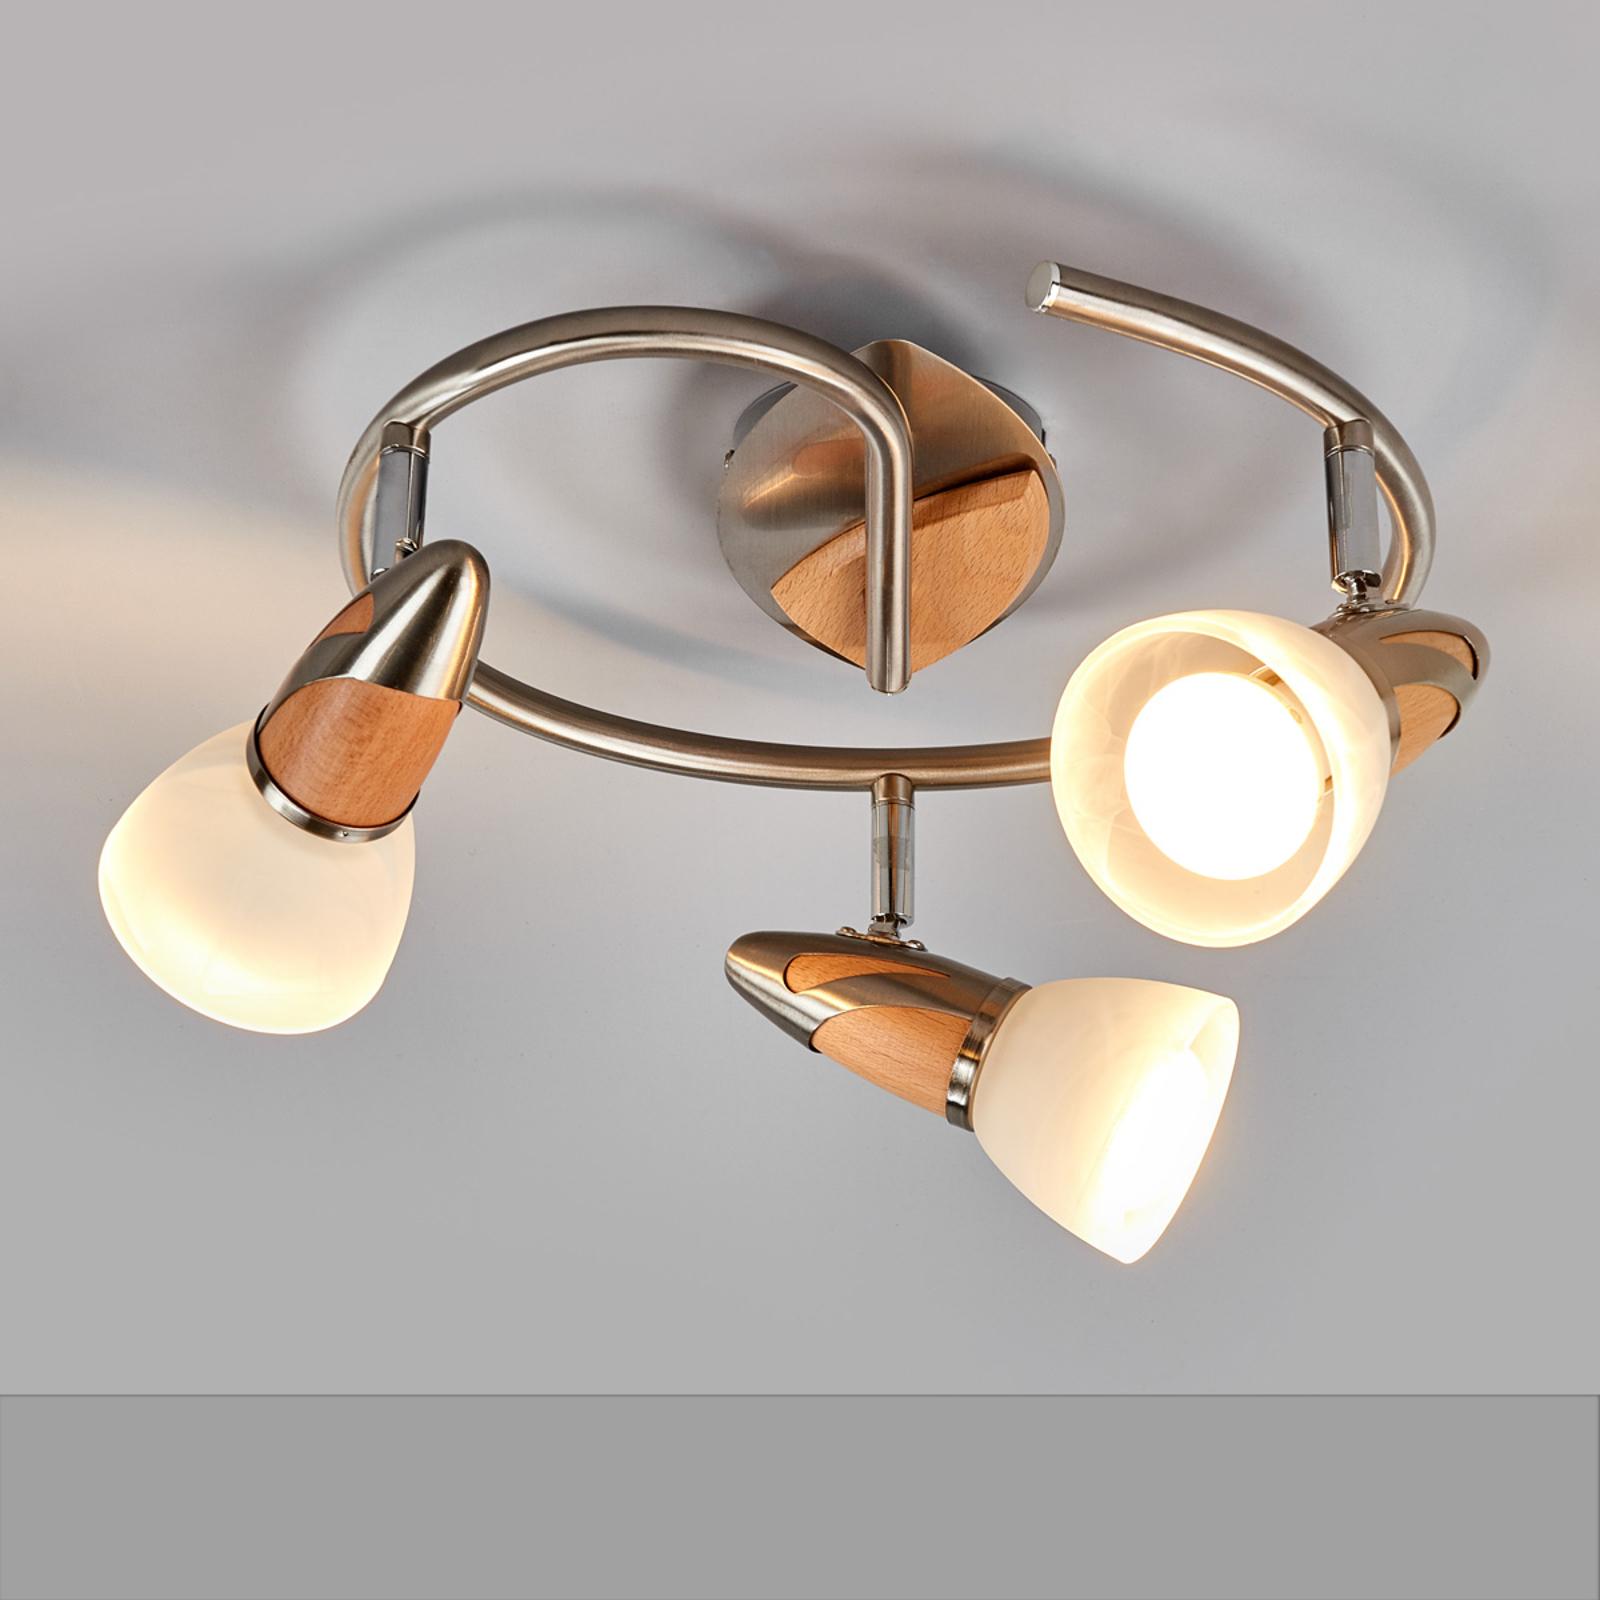 Marena - LED-plafondlamp, 3-lamps